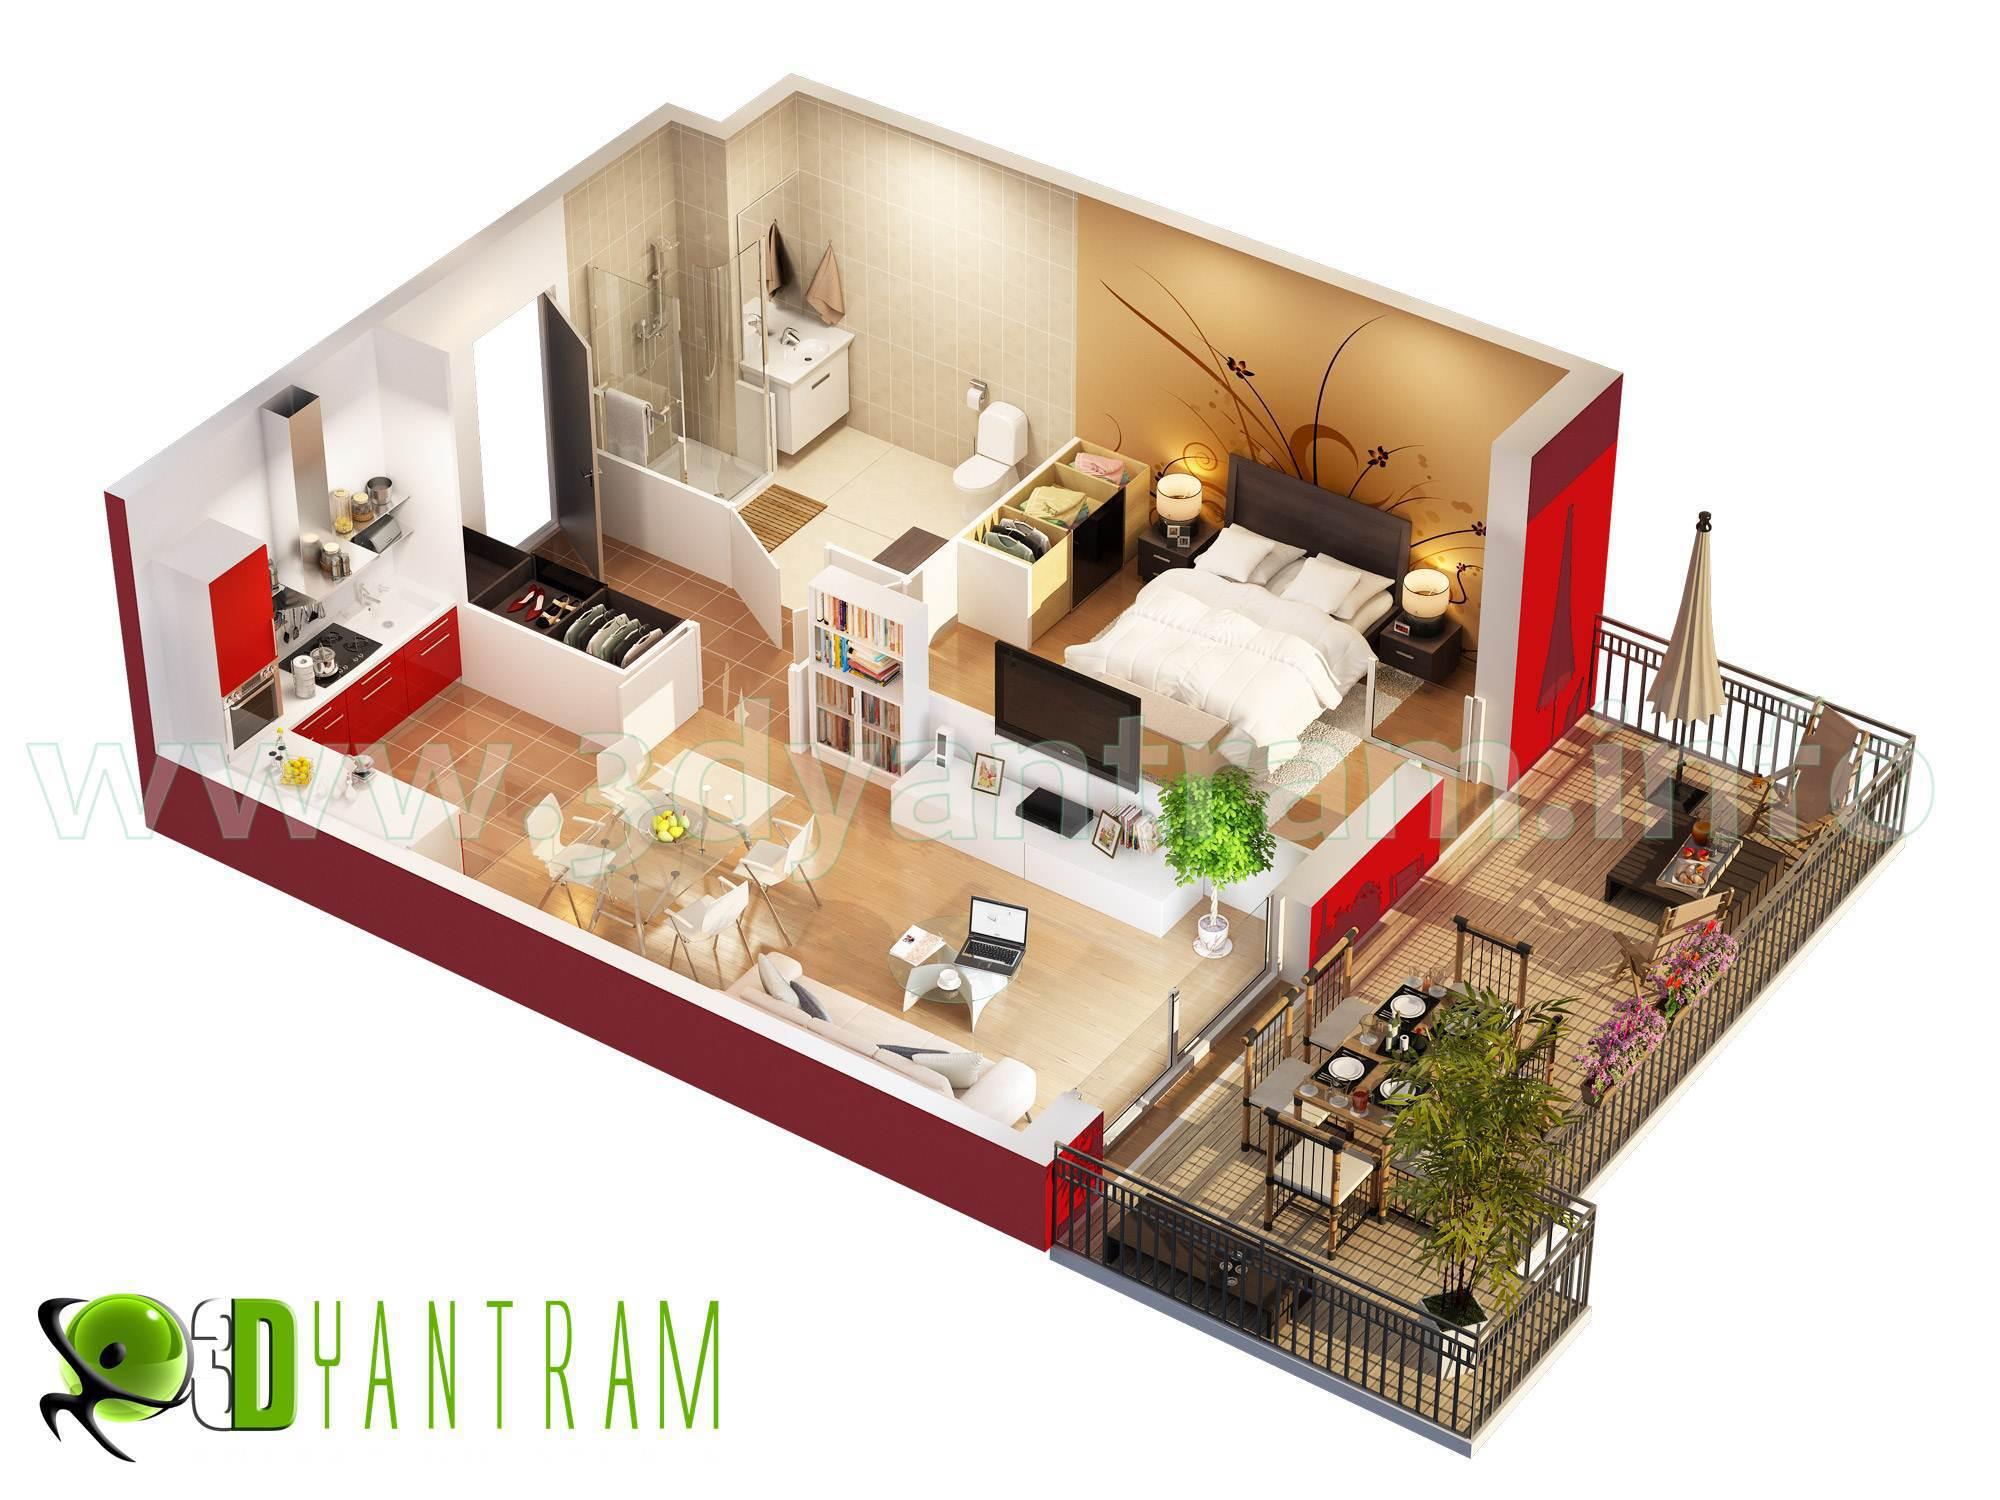 Ruturaj Desai Artwork 3D Home floor plan Design Manila